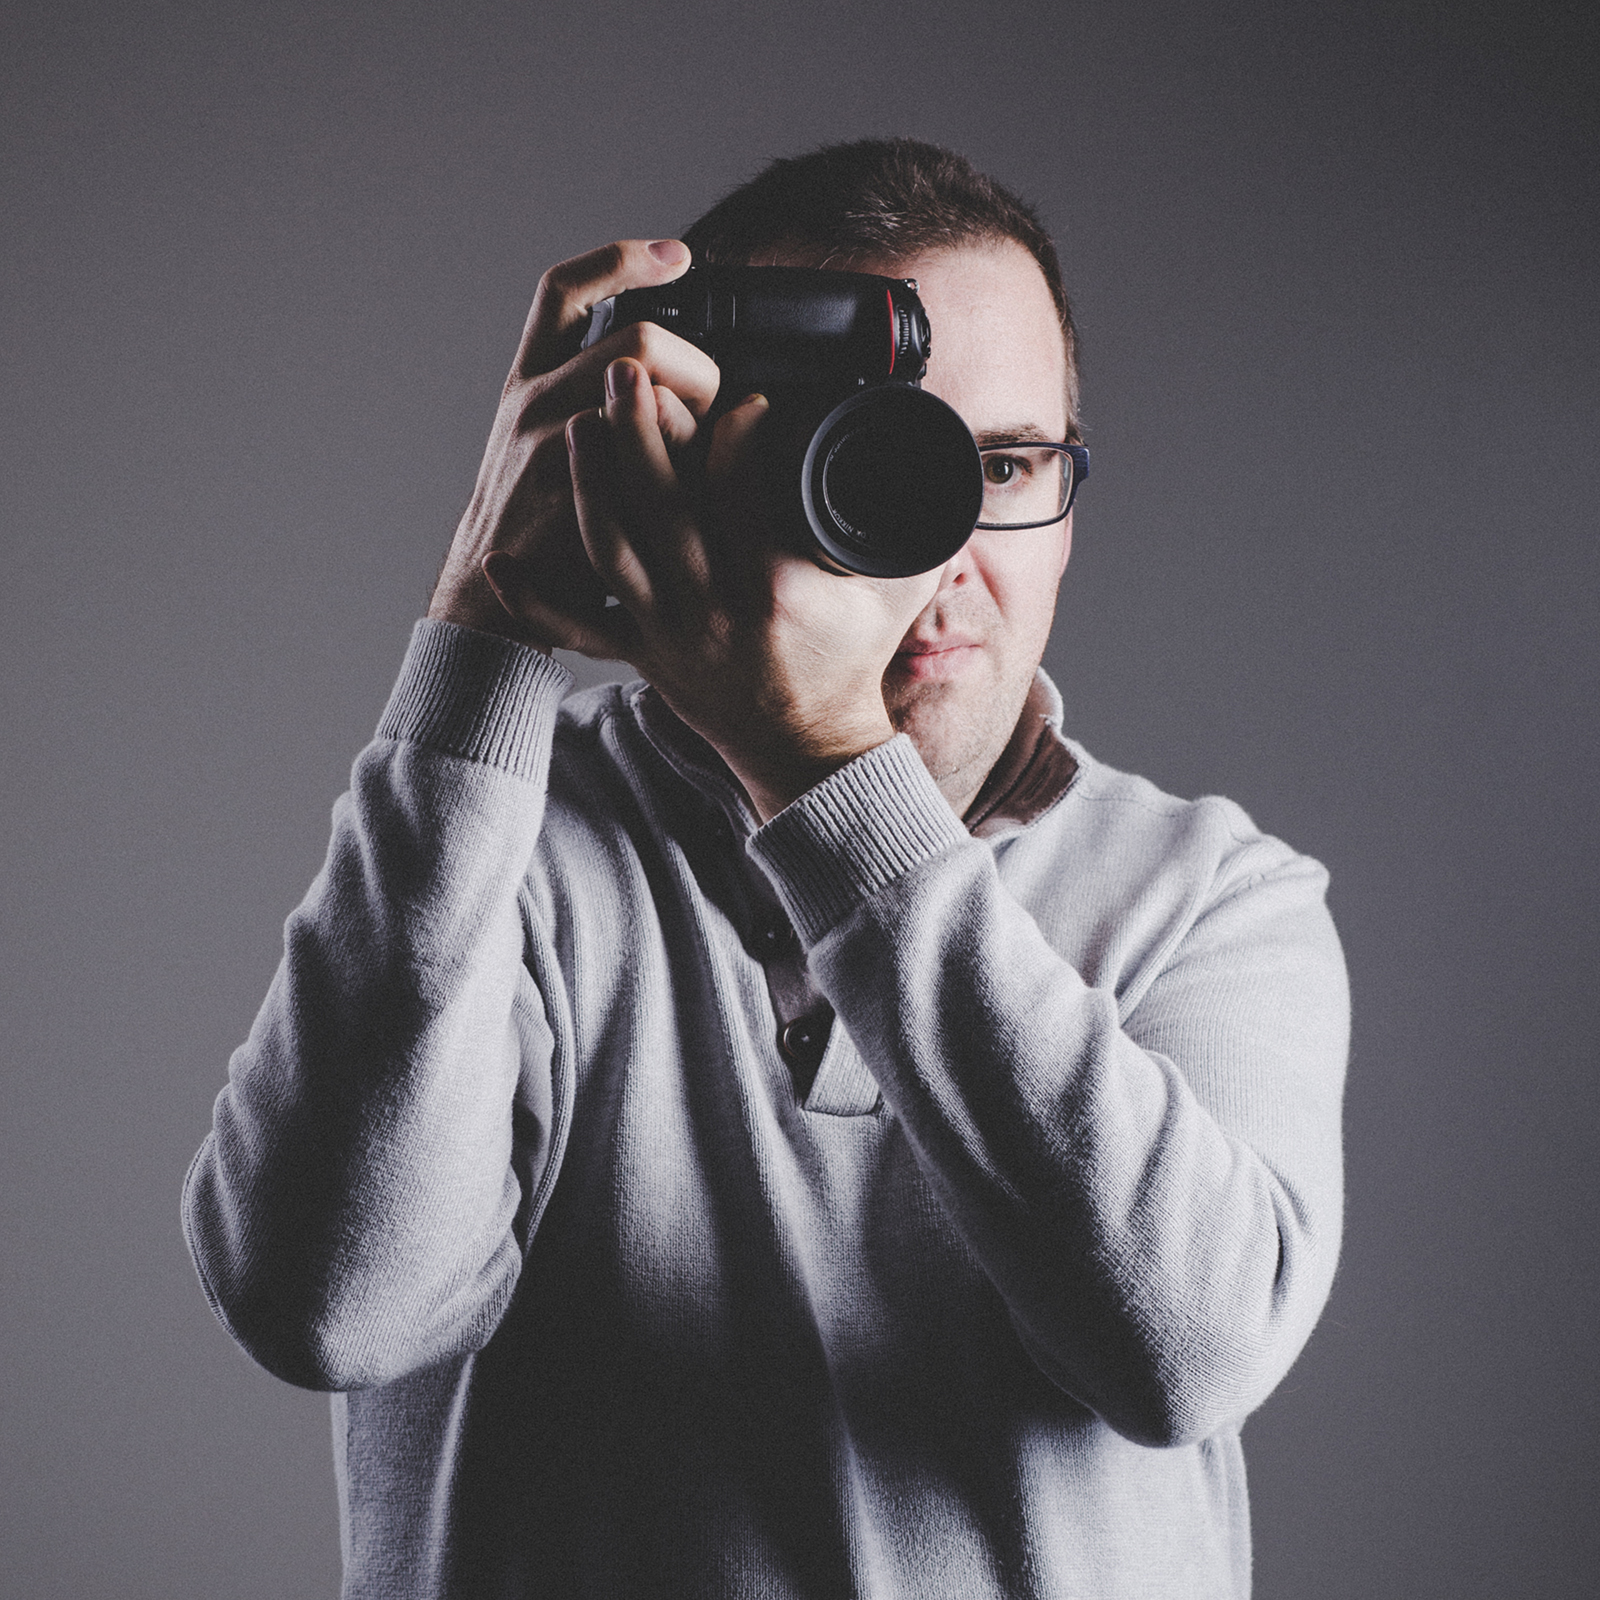 Fotograf Fabian Kauer